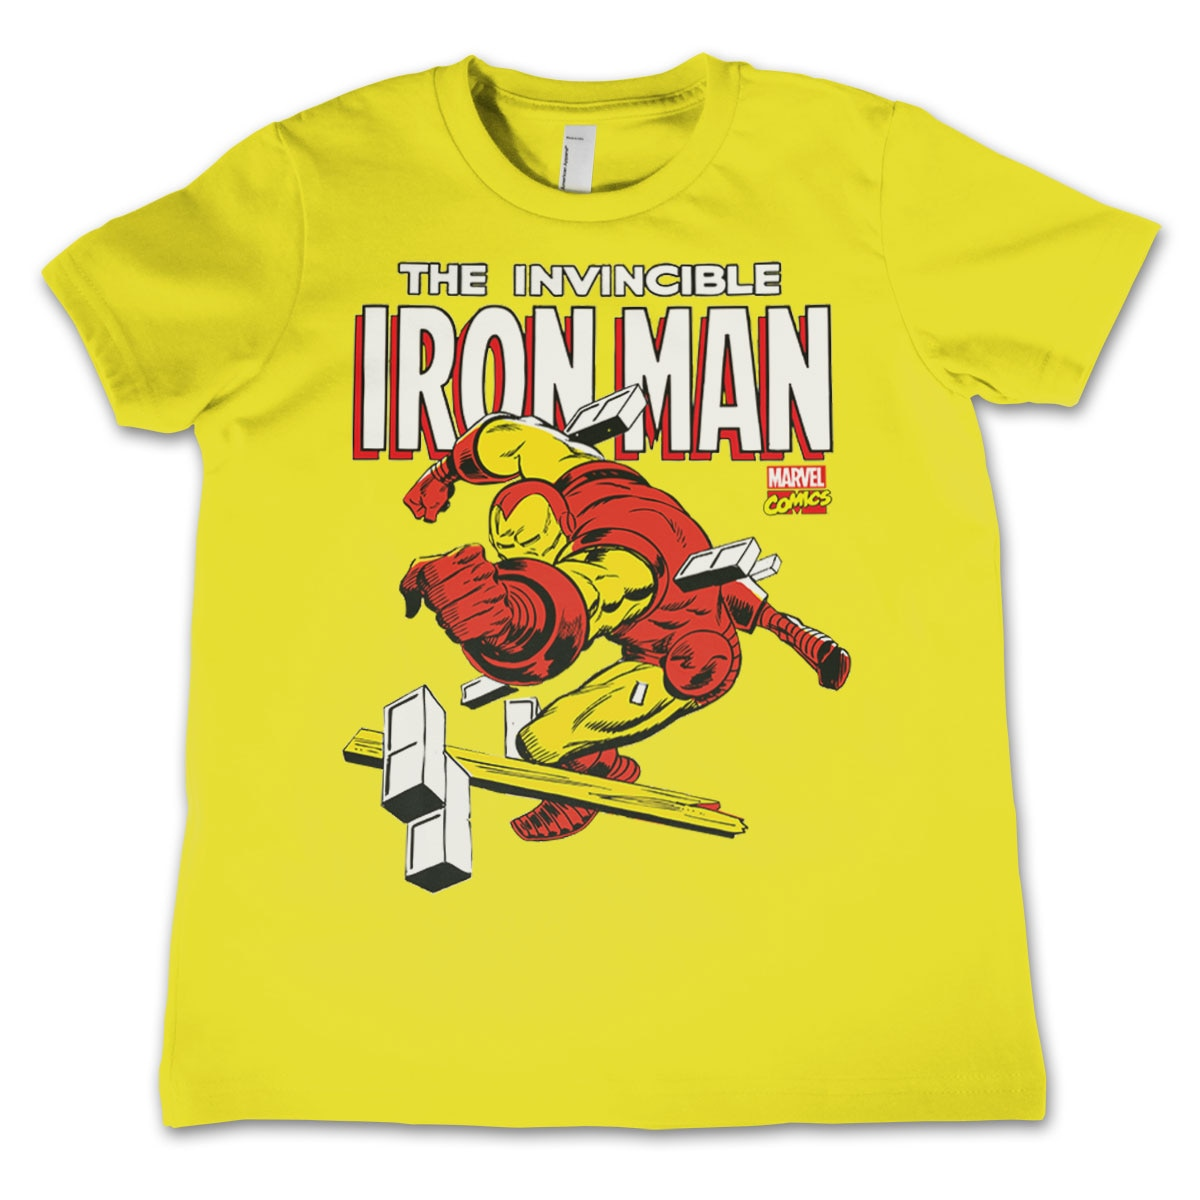 The Invincible Iron Man Kids T-Shirt